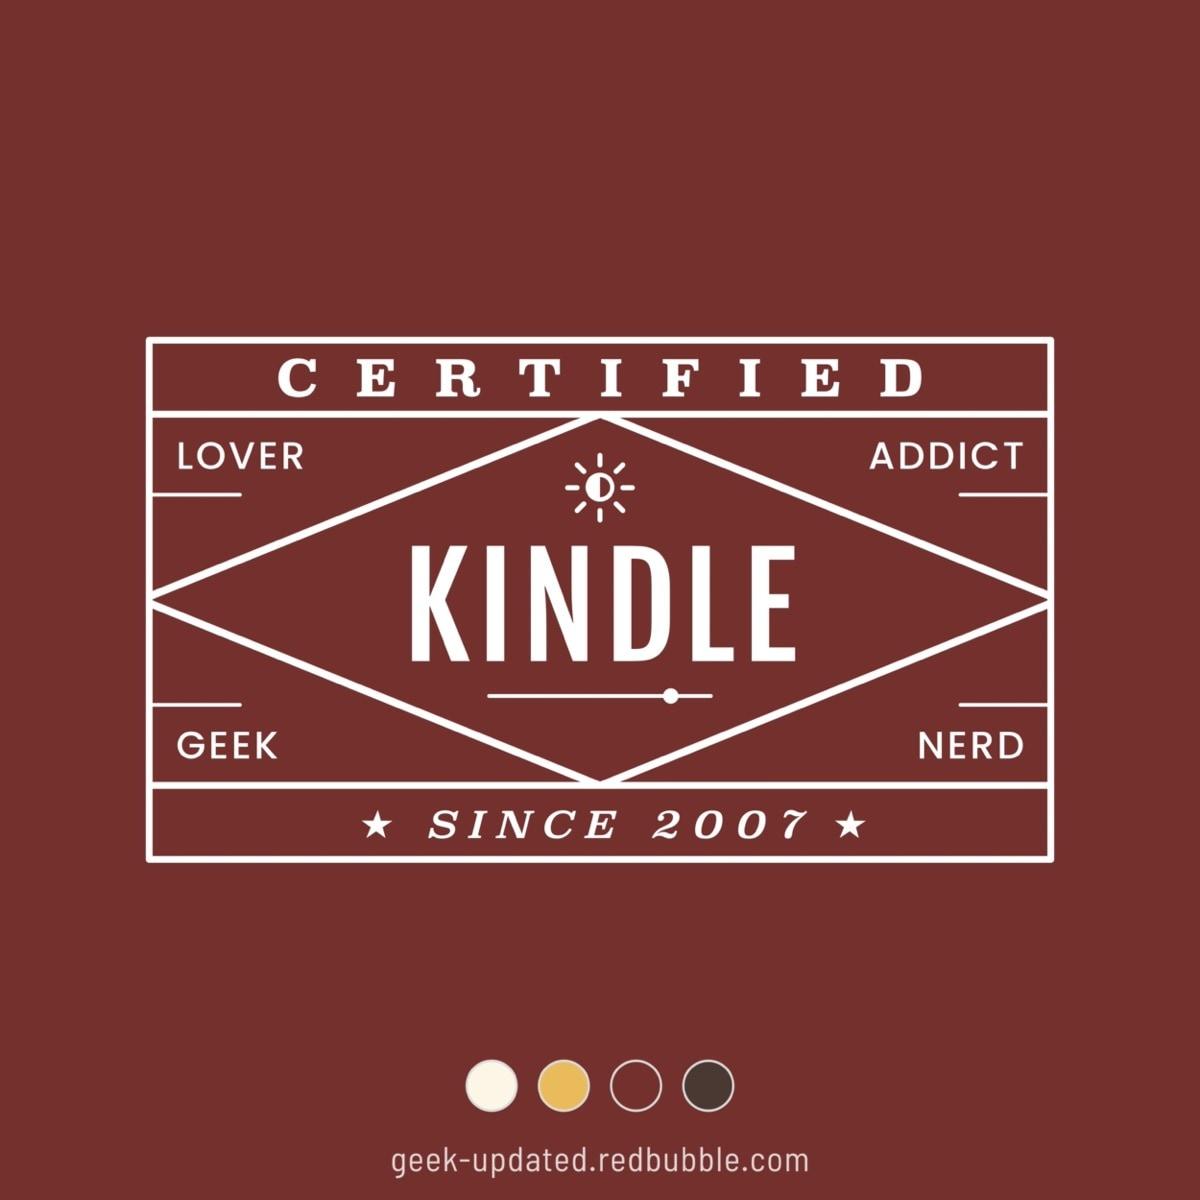 Certified Kindle lover - design by Piotr Kowalczyk